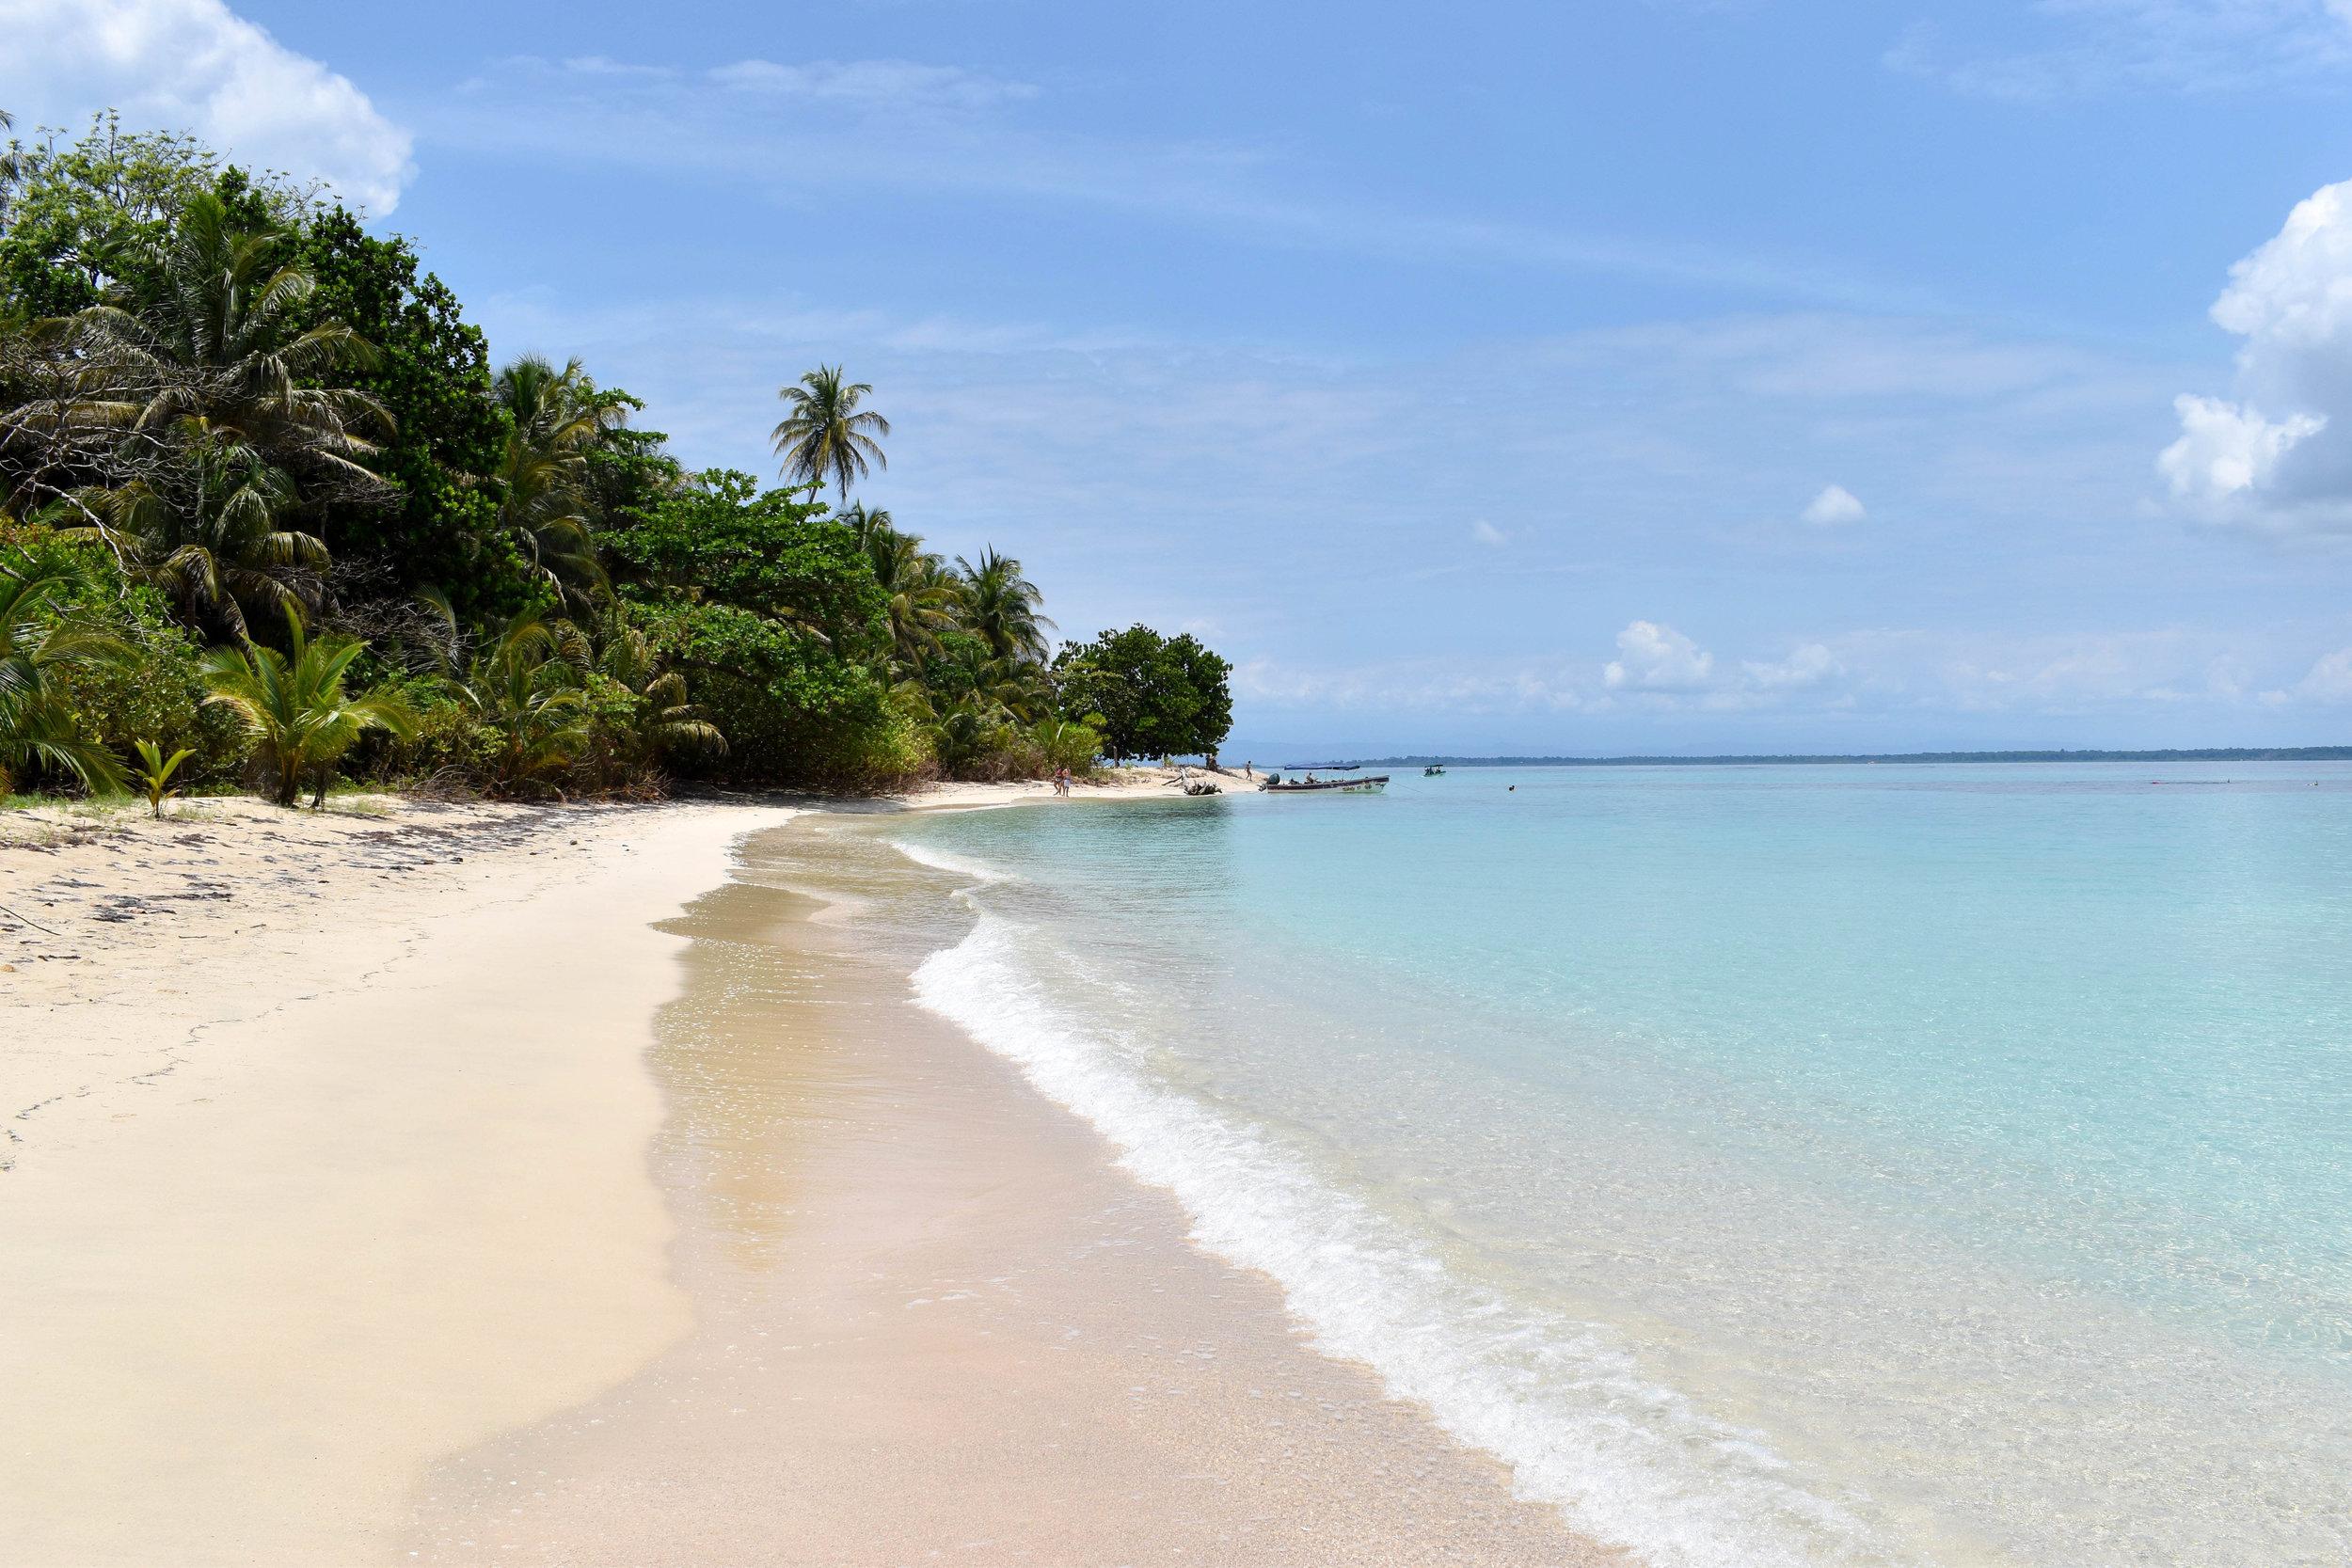 The White Sandy Beach of Cayo Zapatilla in Panama